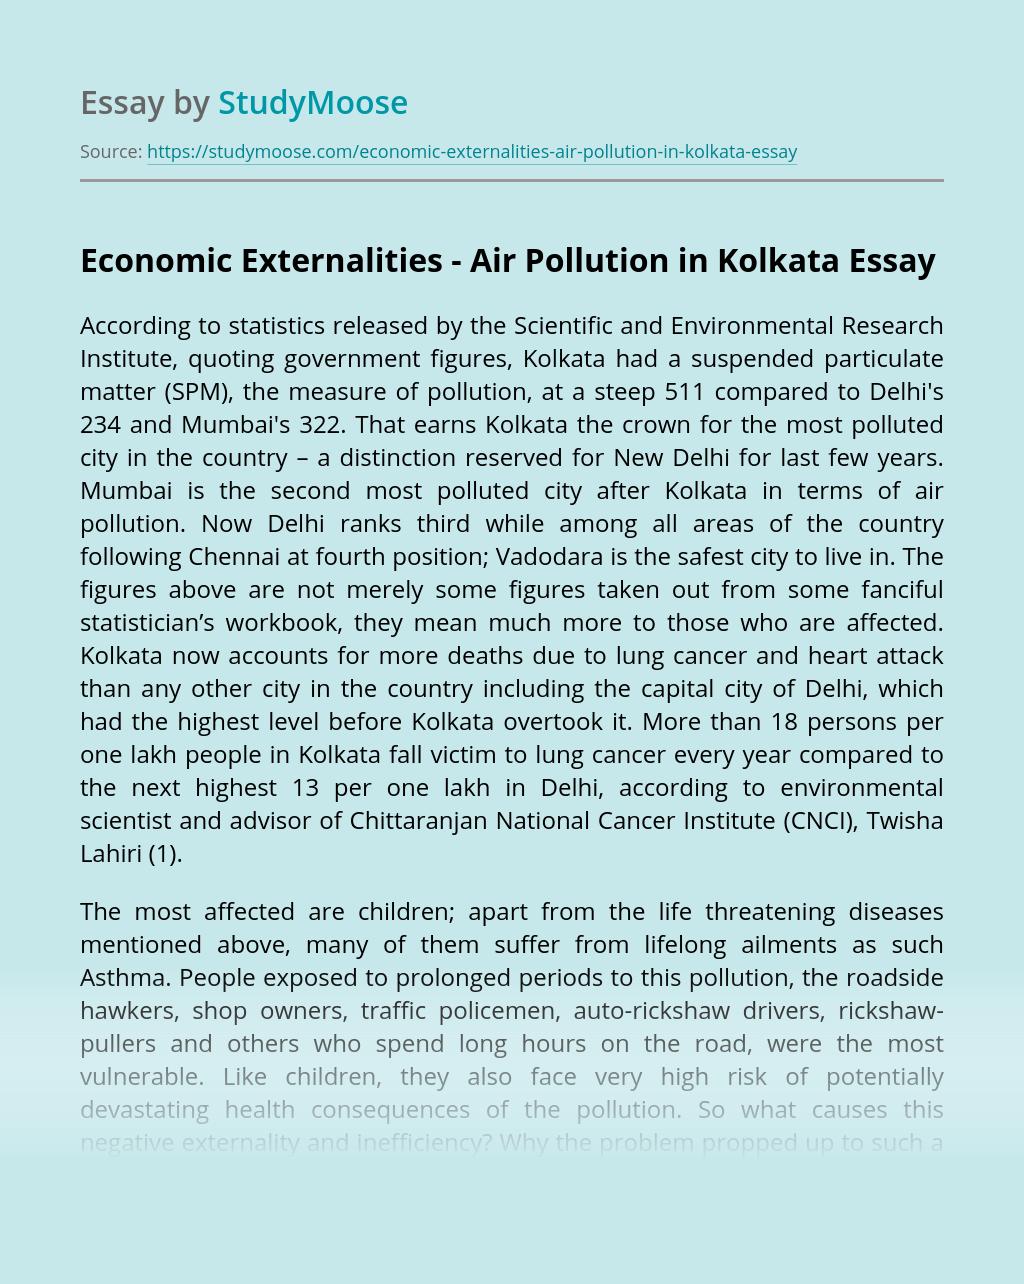 Economic Externalities - Air Pollution in Kolkata